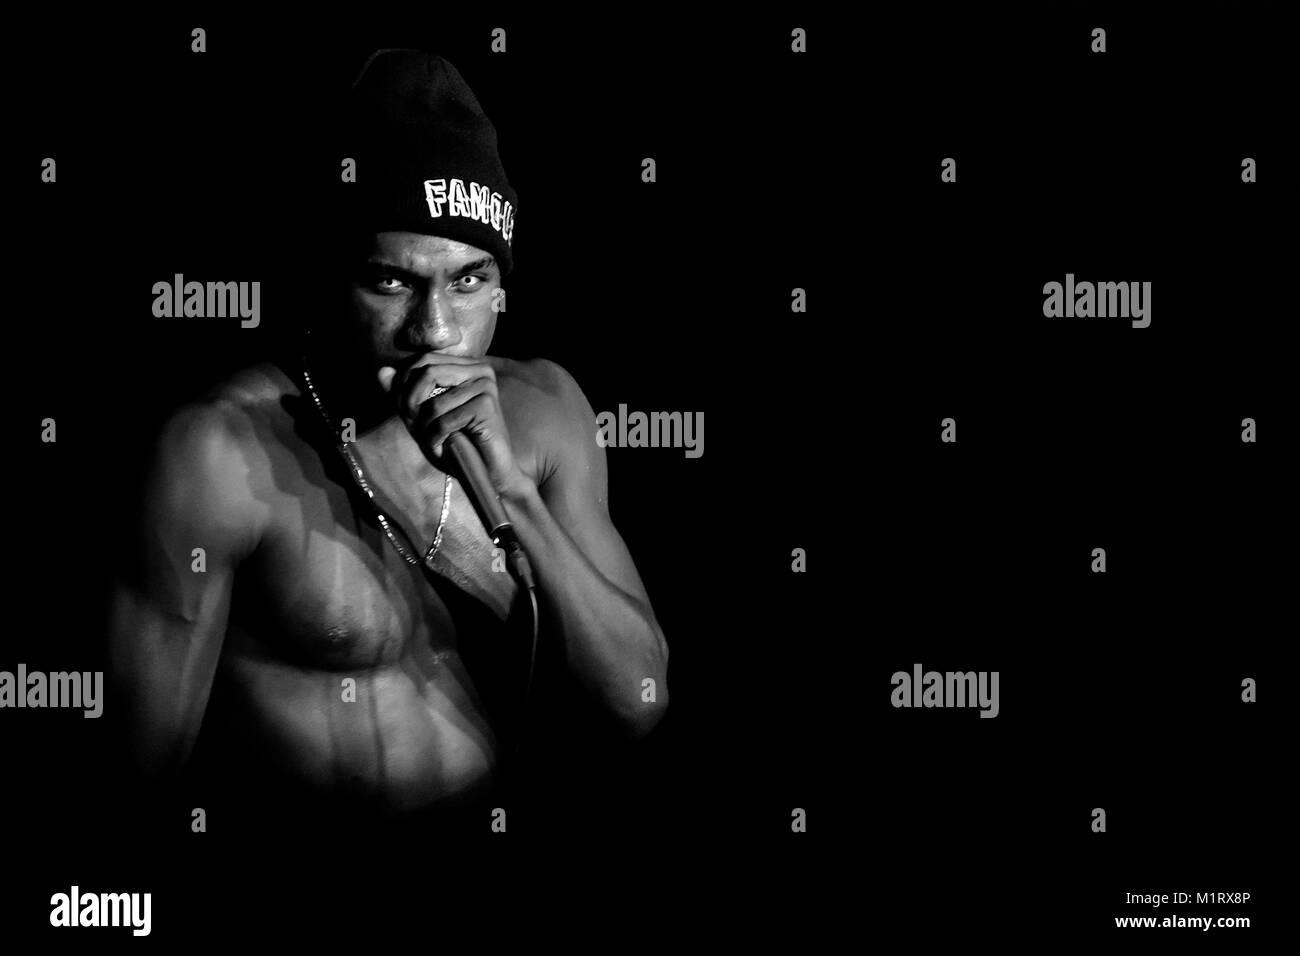 New Marcus Jamal Hopson Rapper Music Hopsin Star T-300 Silk Fabric Poster